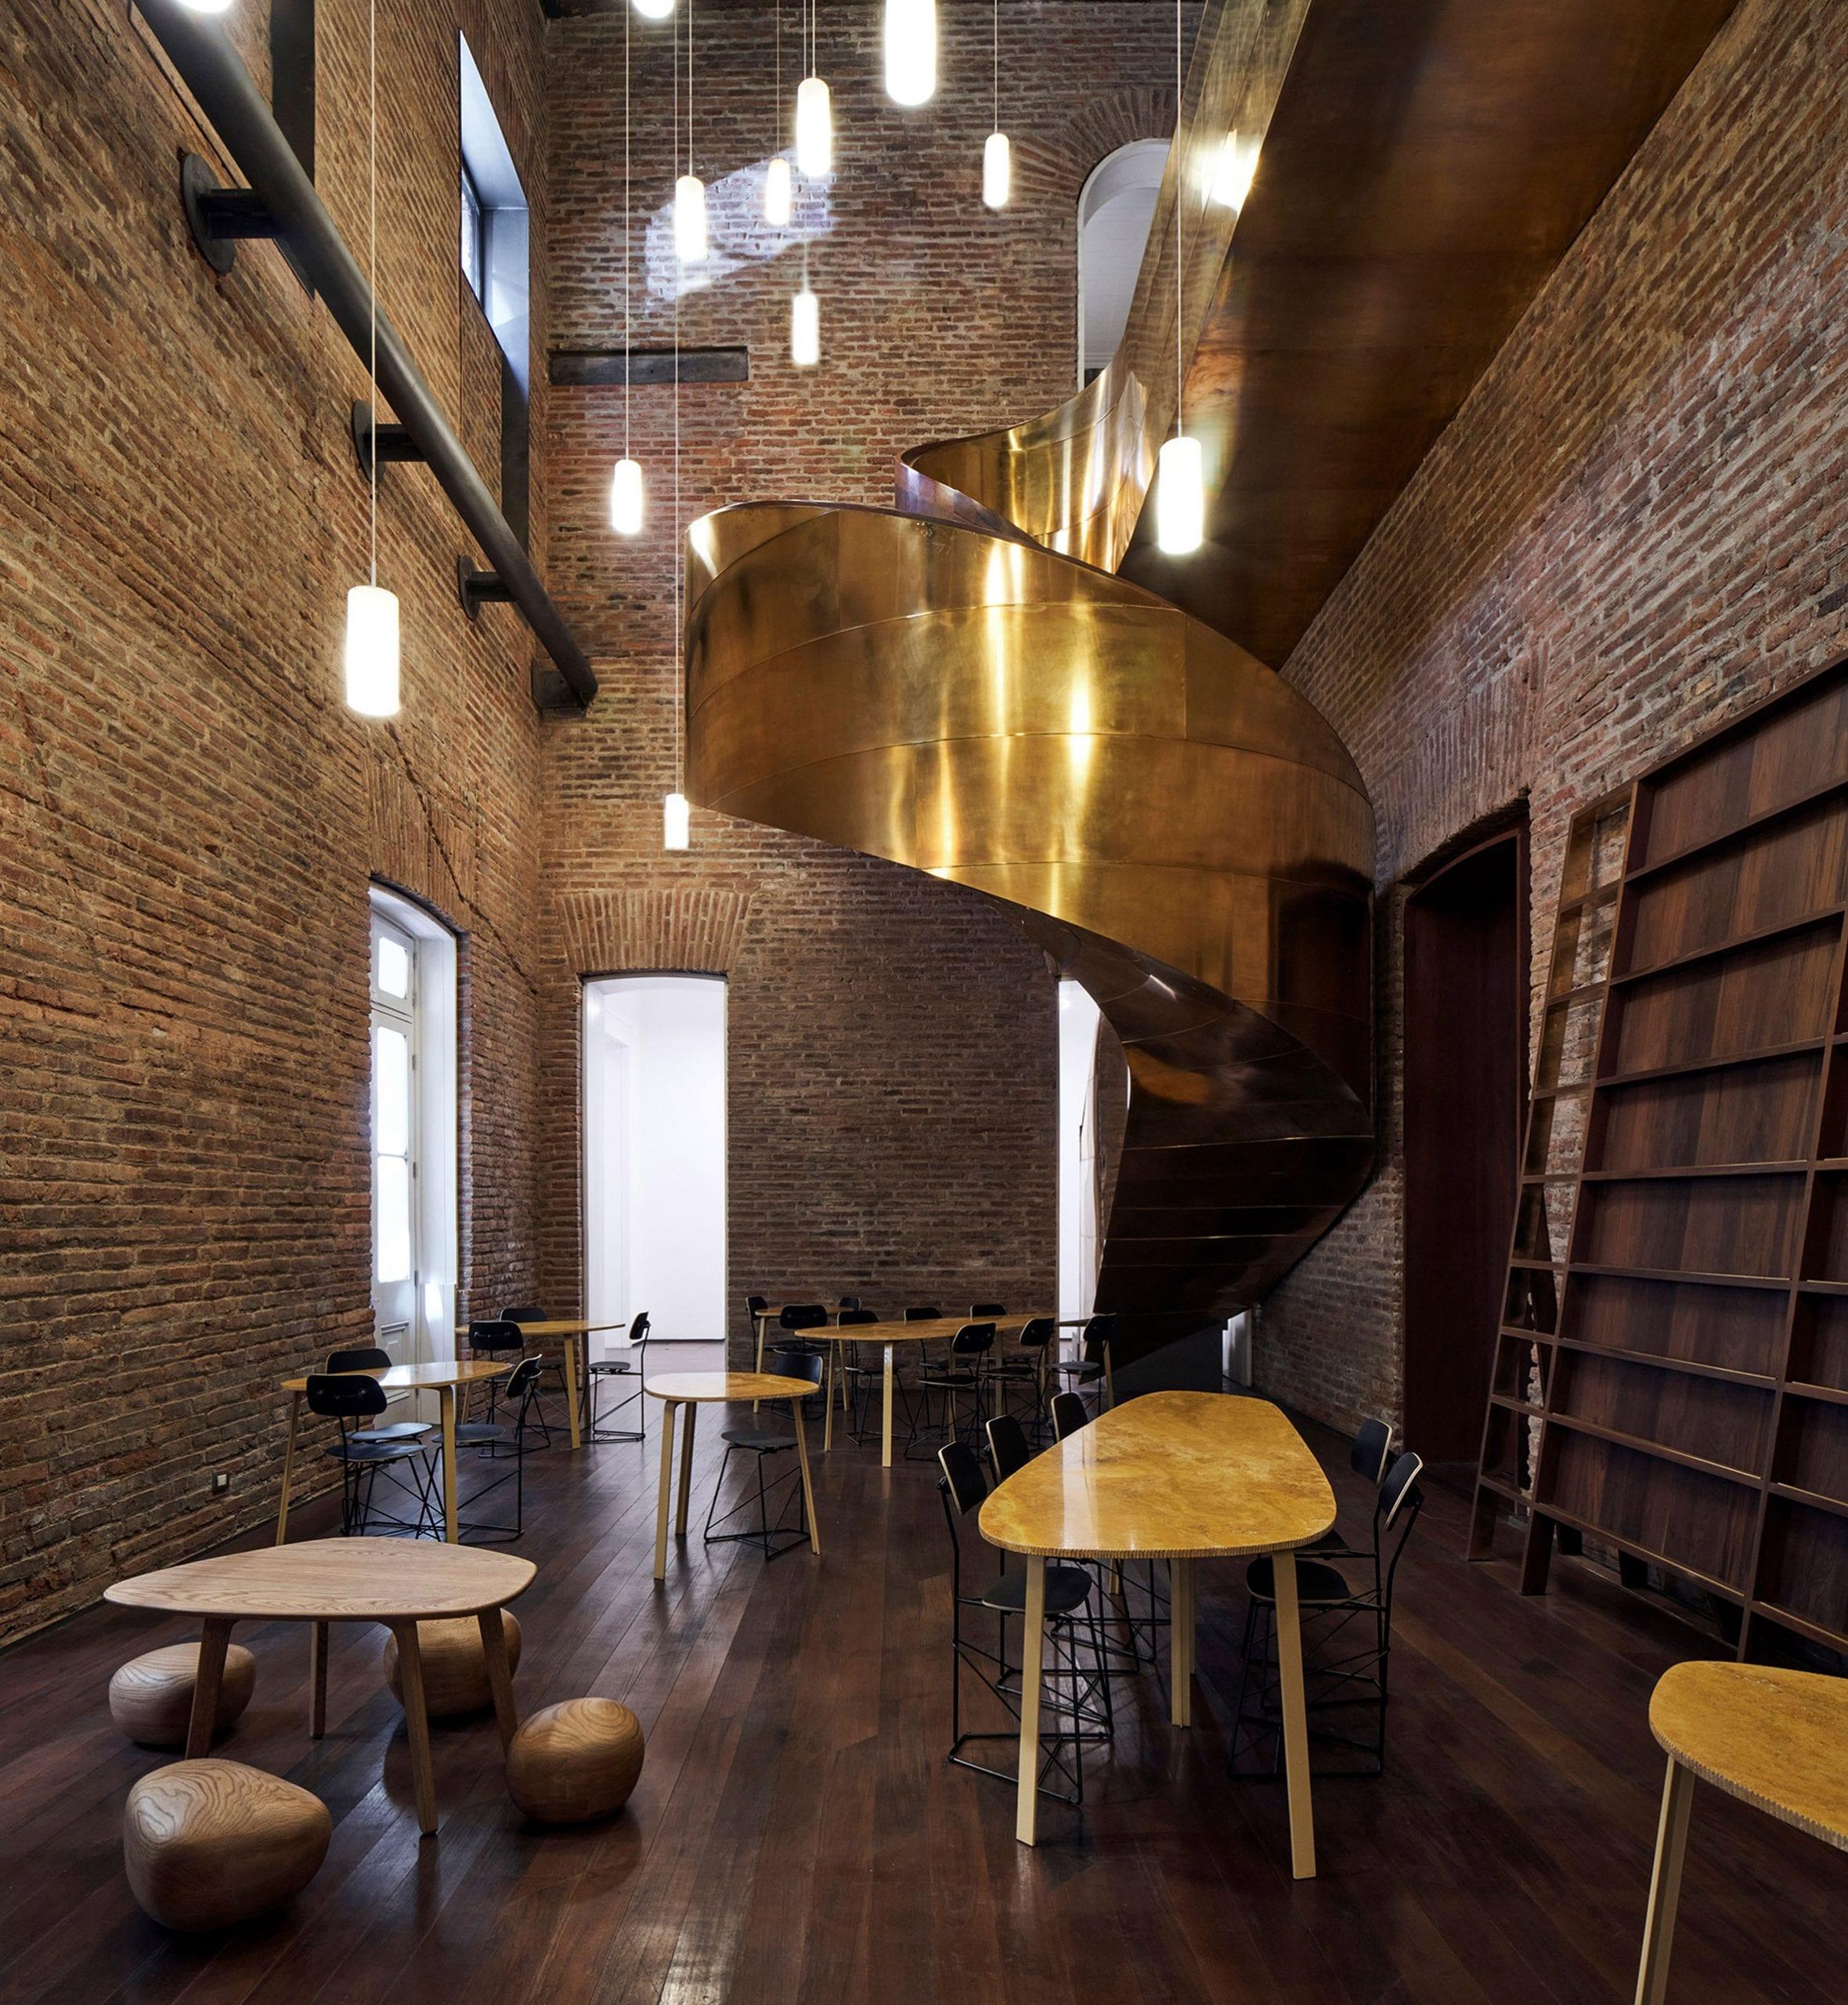 Bronze helical staircase in Interiors of Palacio Pereira by Cecilia Puga, Paula Velasco and Alberto Moletto